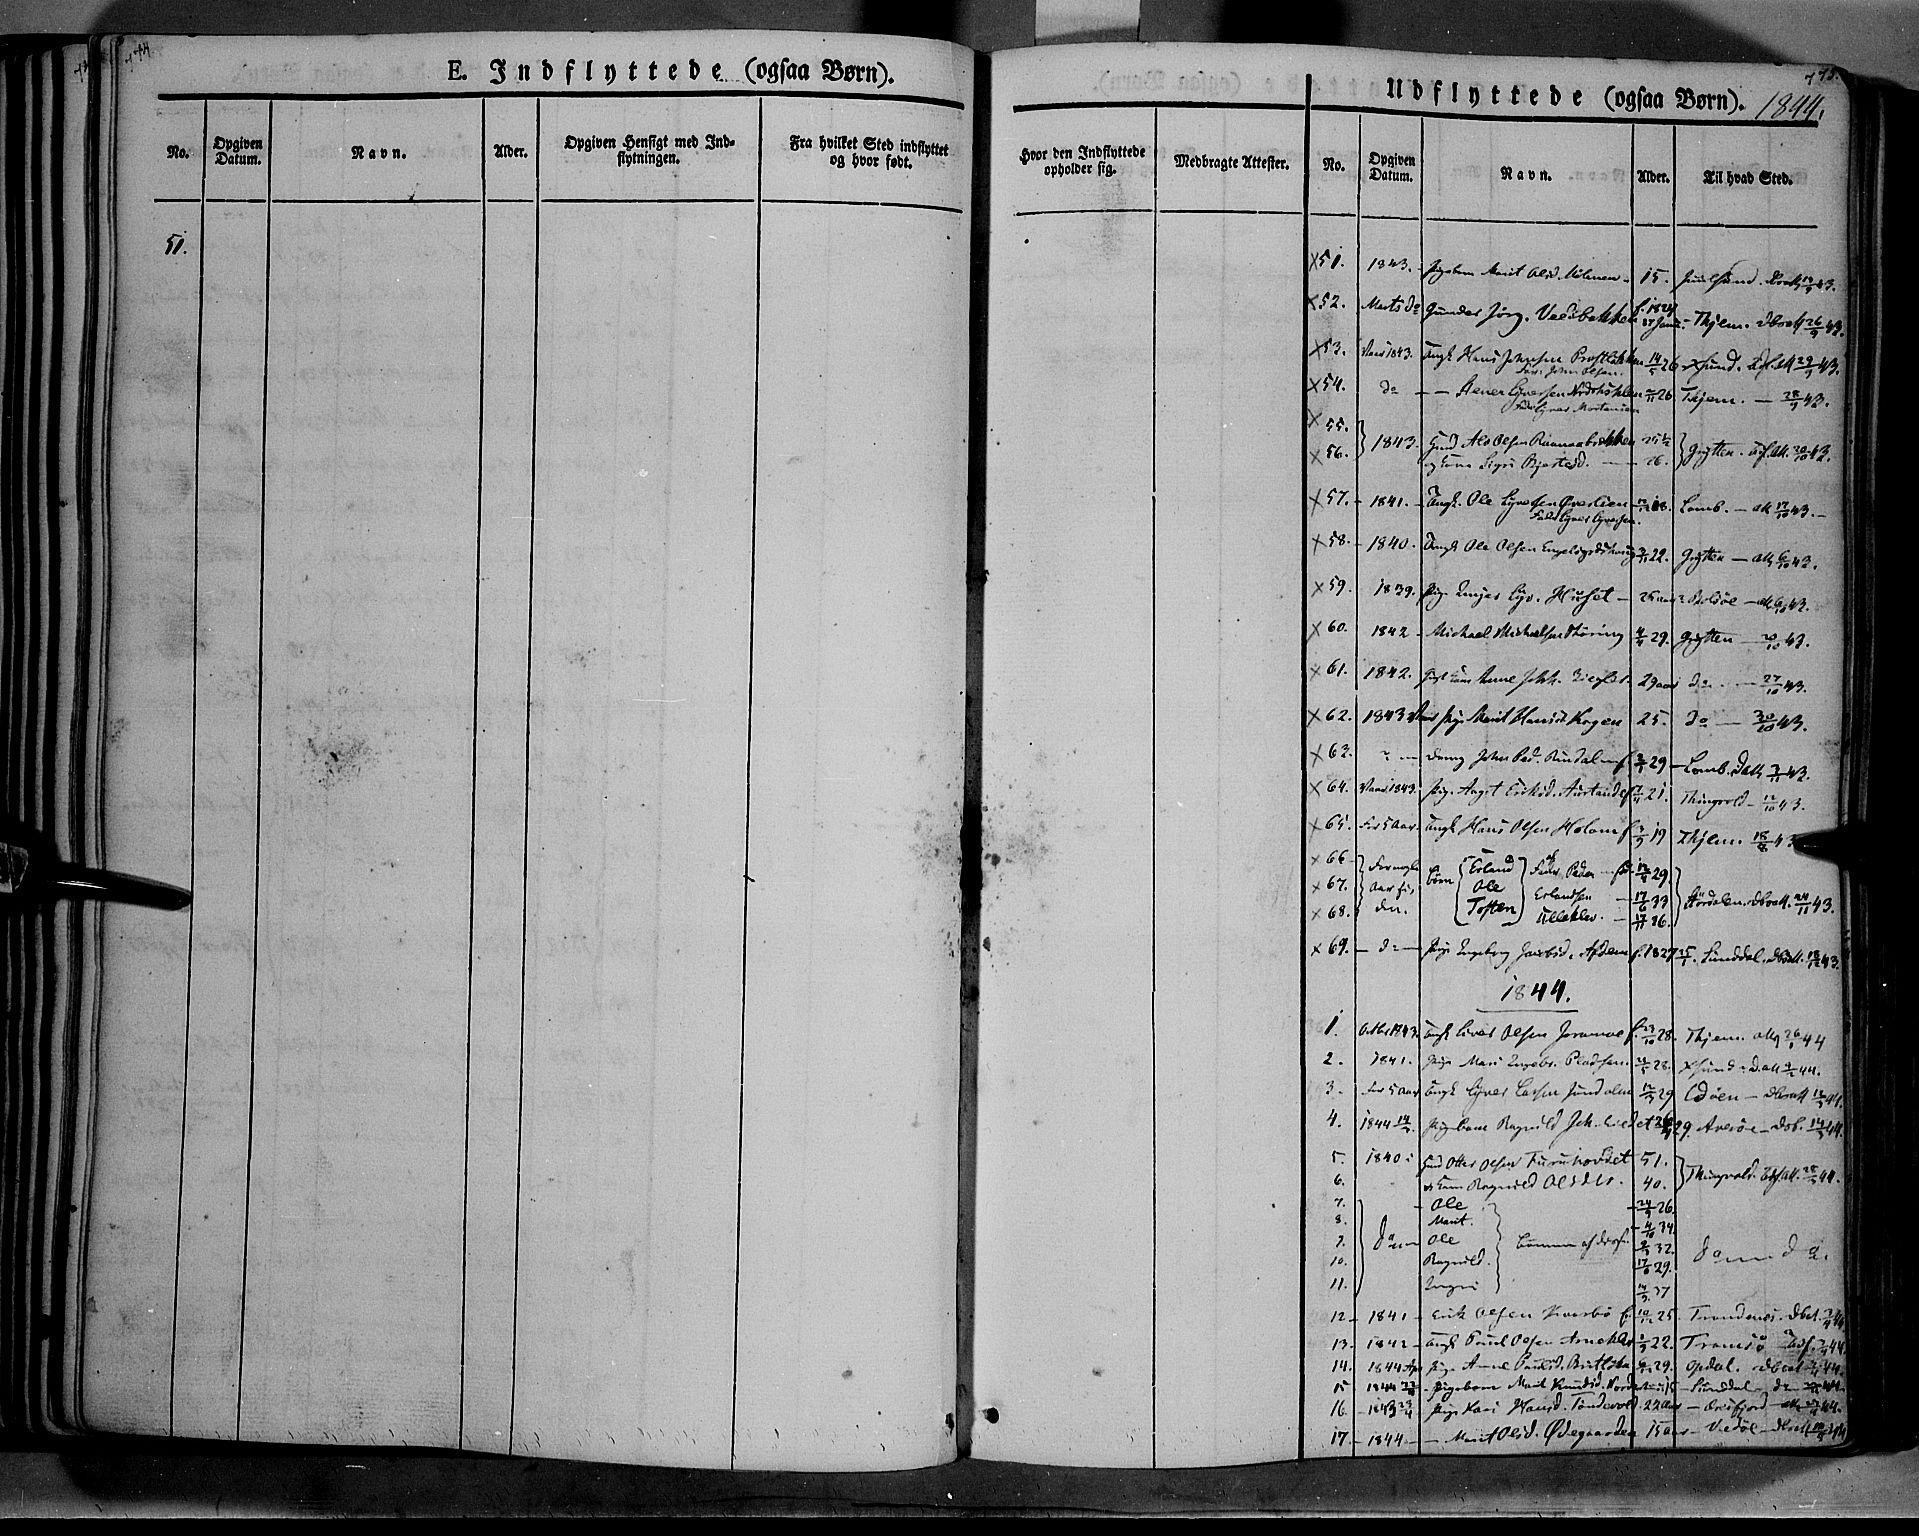 SAH, Lesja prestekontor, Ministerialbok nr. 6B, 1843-1854, s. 774-775